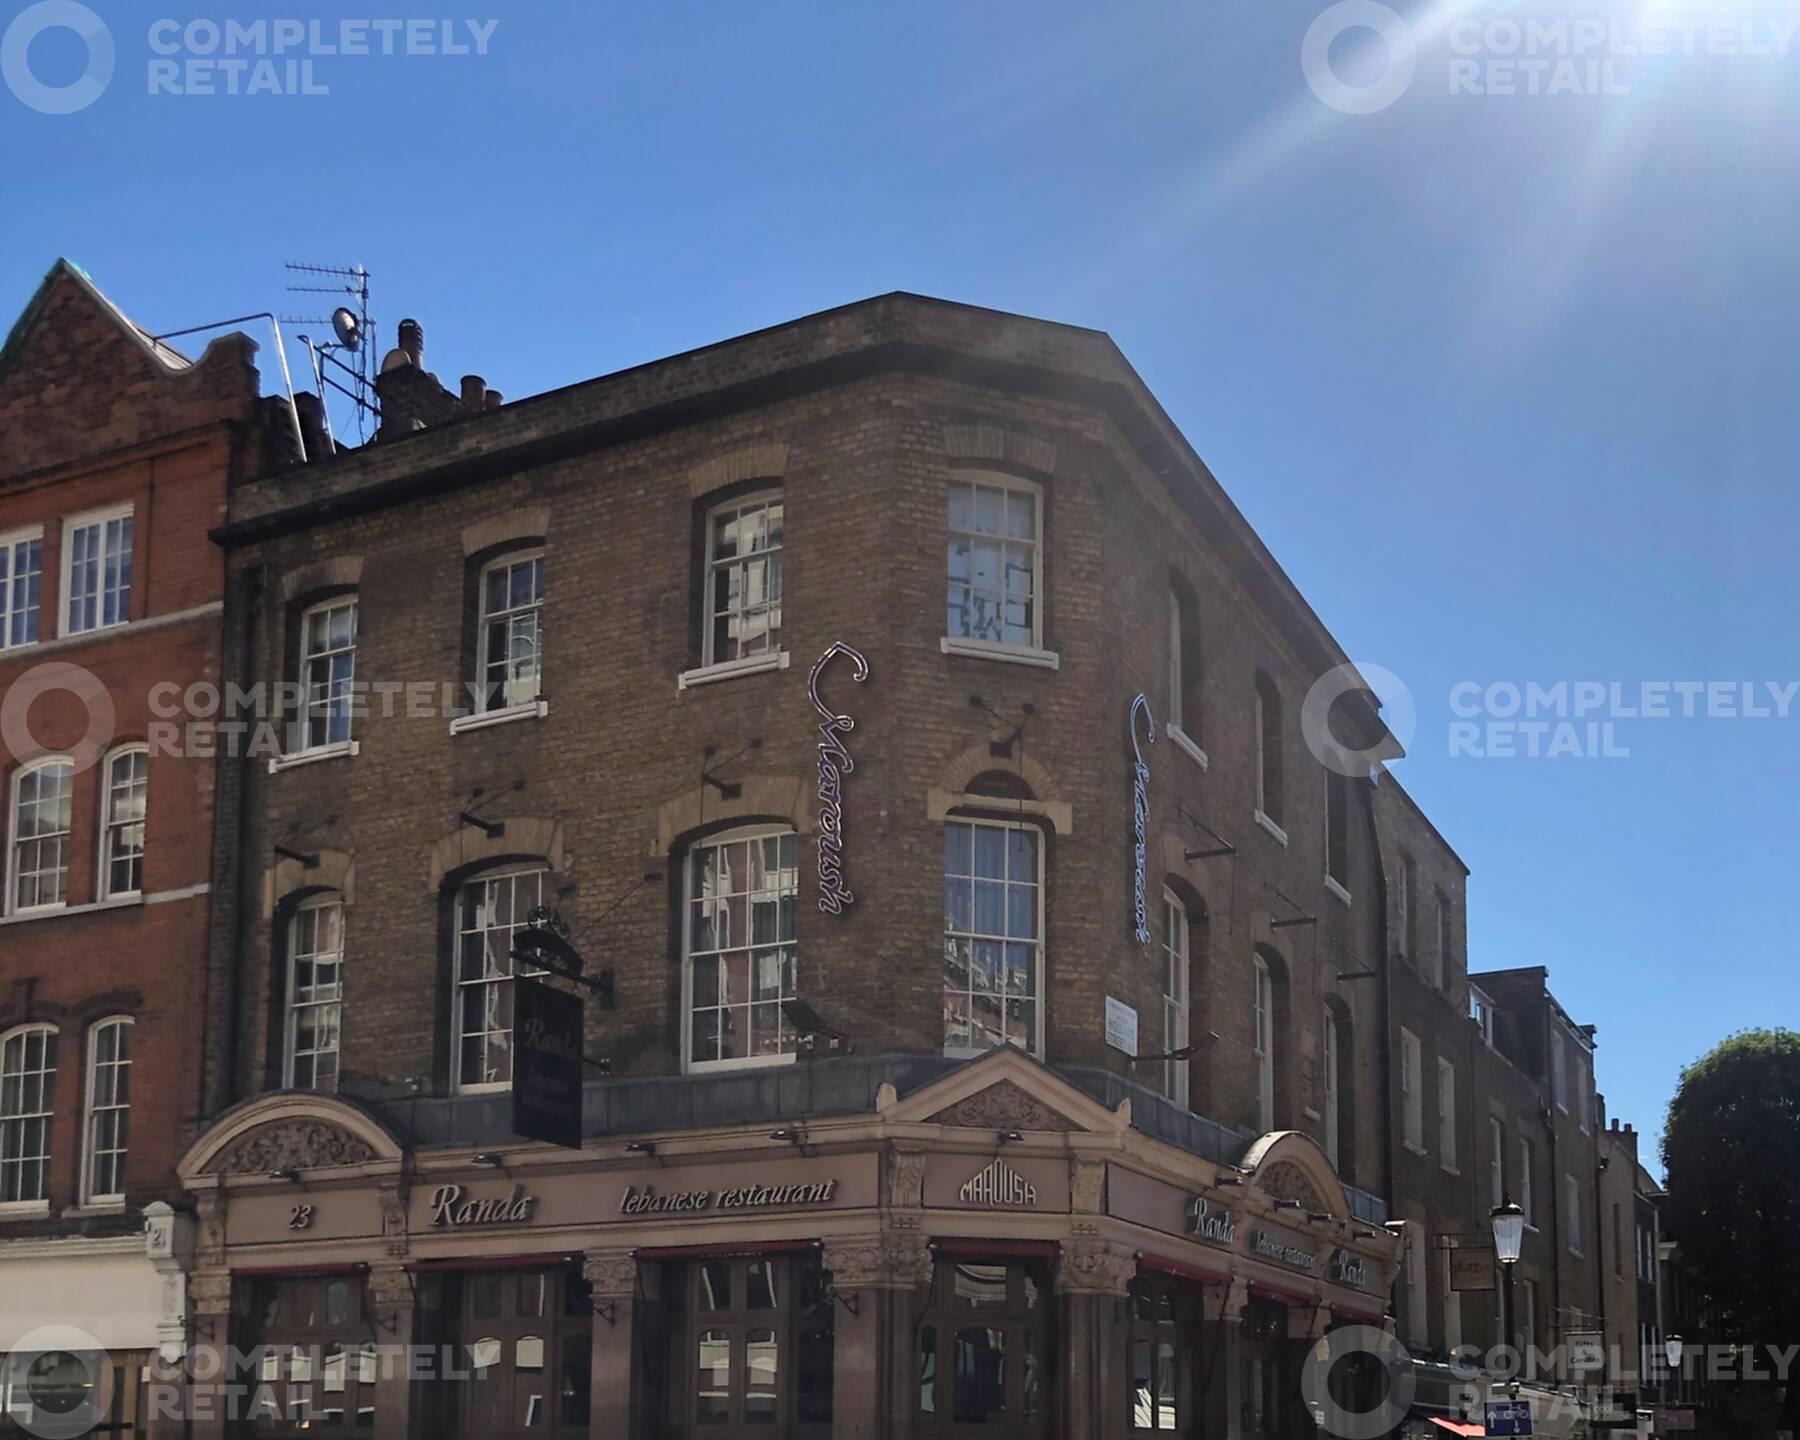 23 Kensington Church Street, London, W8 4LF